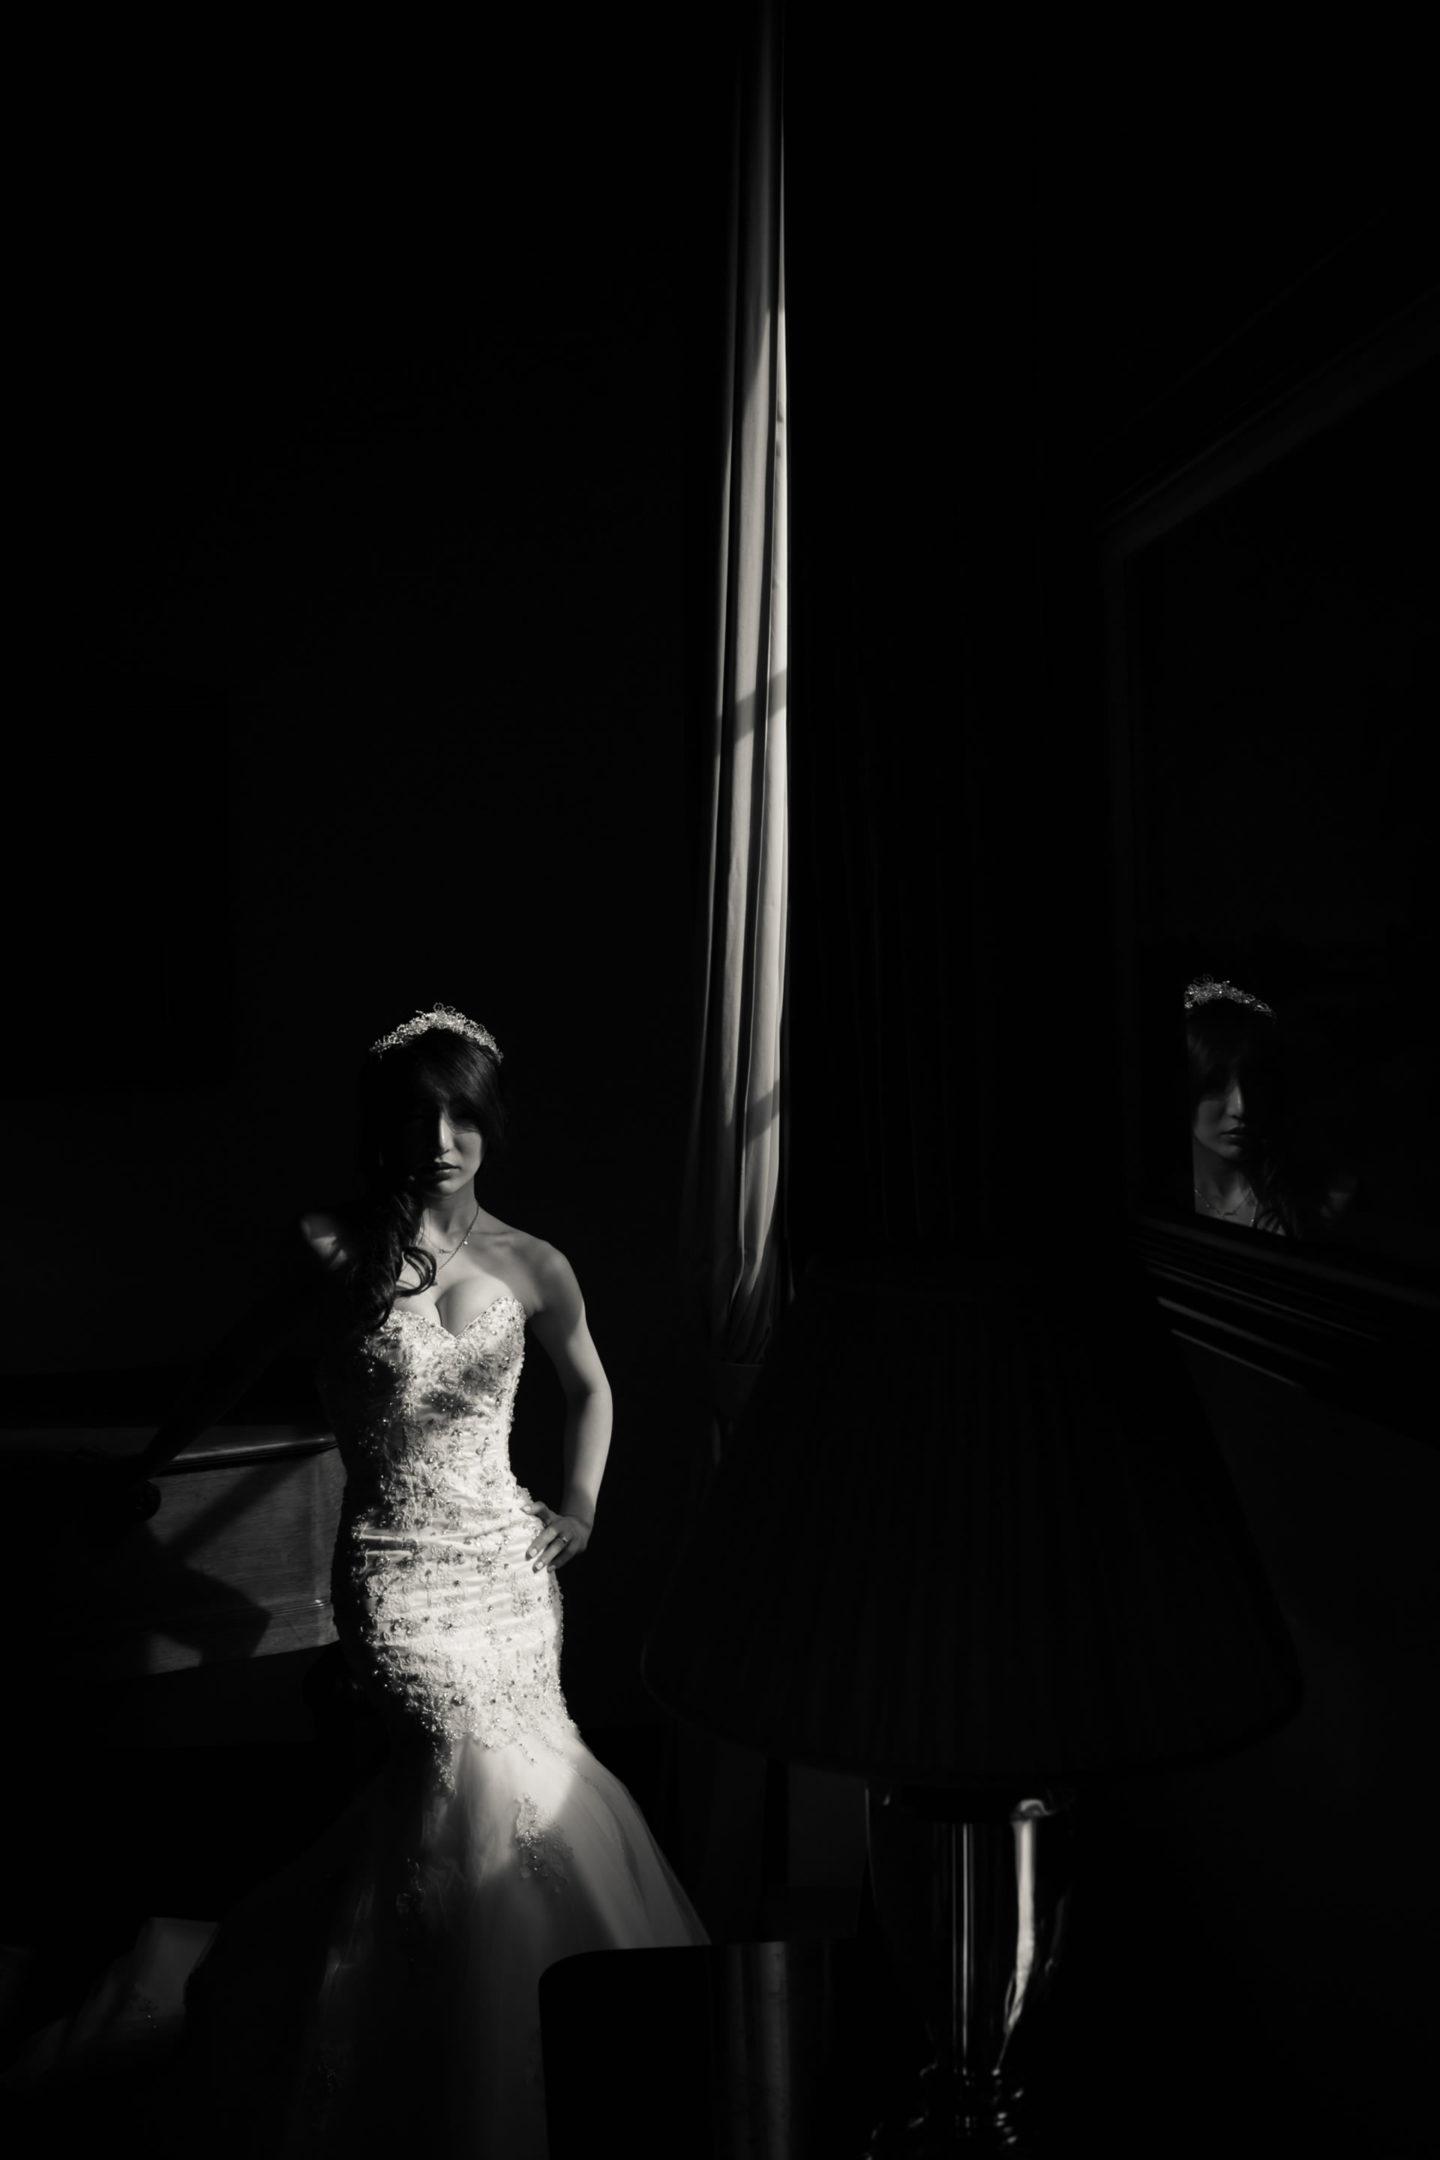 drama-photography-david-bastianoni-photographer-00044